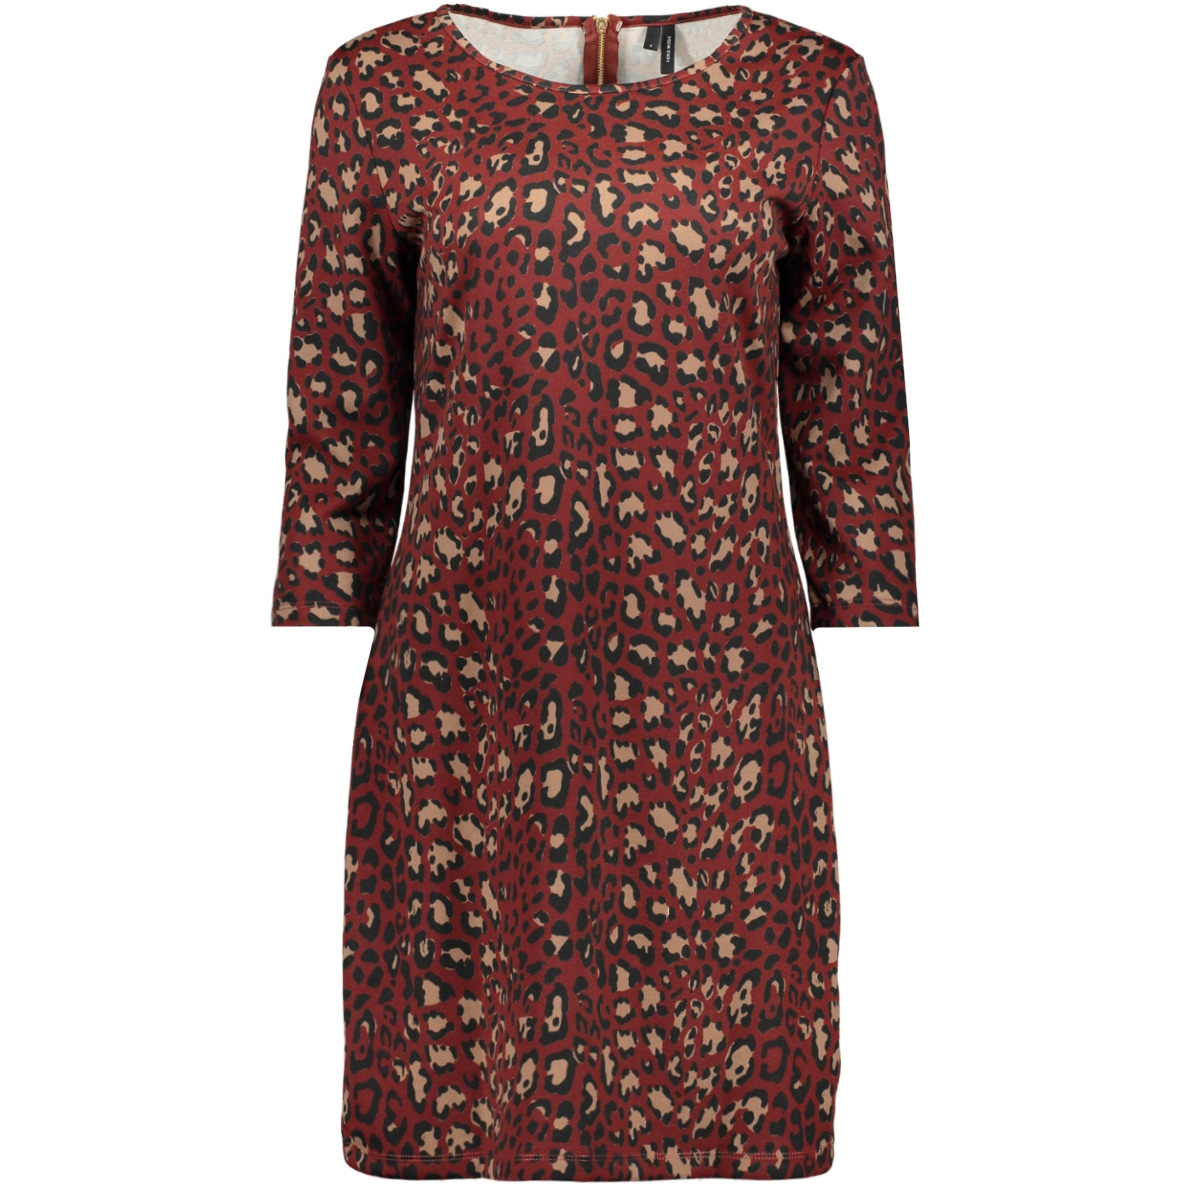 vmvigga 3/4 plain short dress aop c 10226296 vero moda jurk madder brown/lea